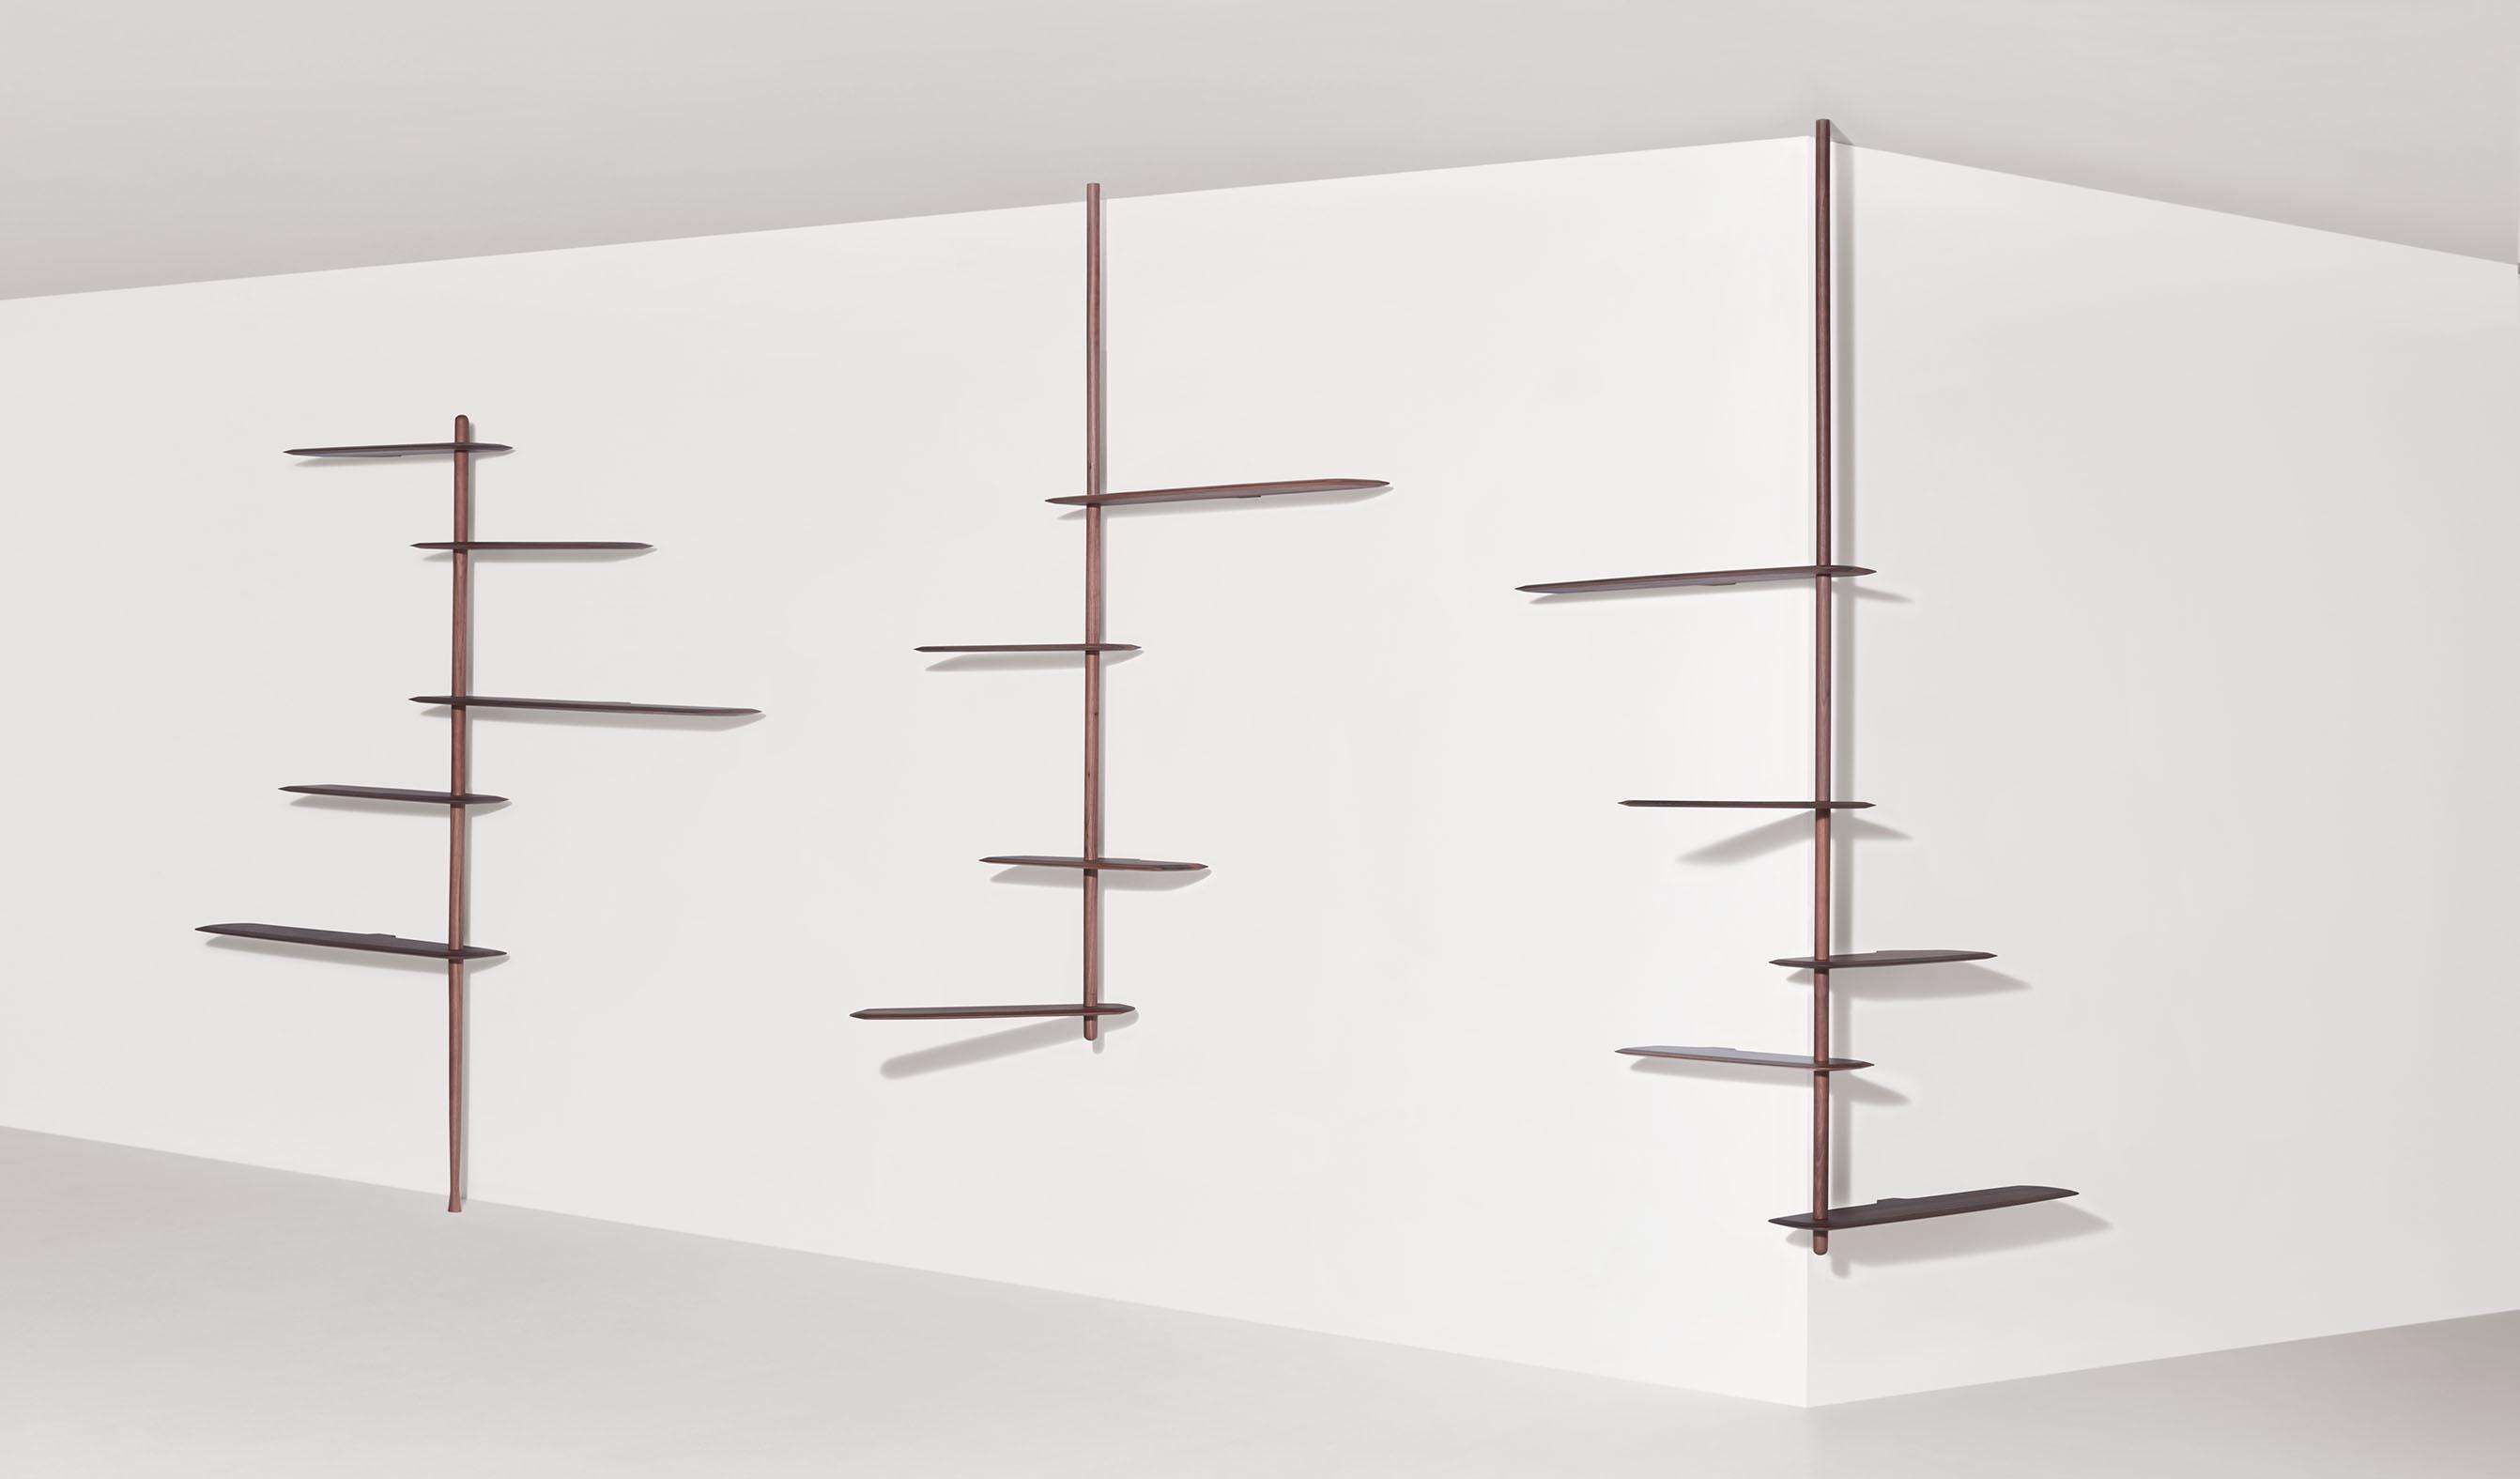 Estantería Unica shelf system nomon home unica 17